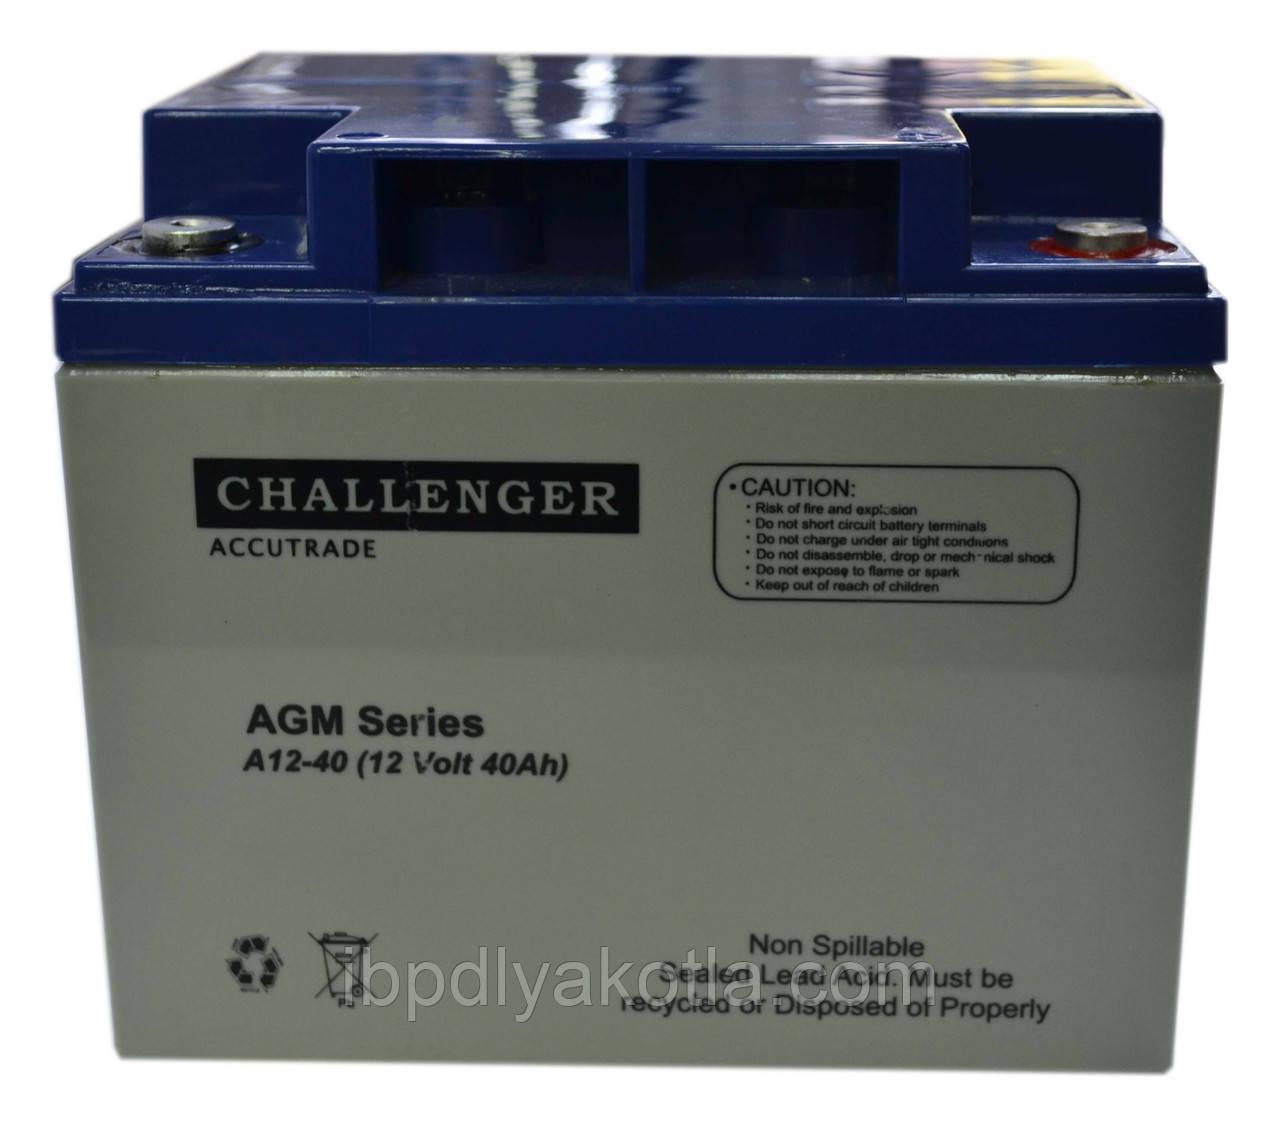 Аккумулятор мультигелевый Challenger A12-40 12V 40AH, (AGM) для ИБП